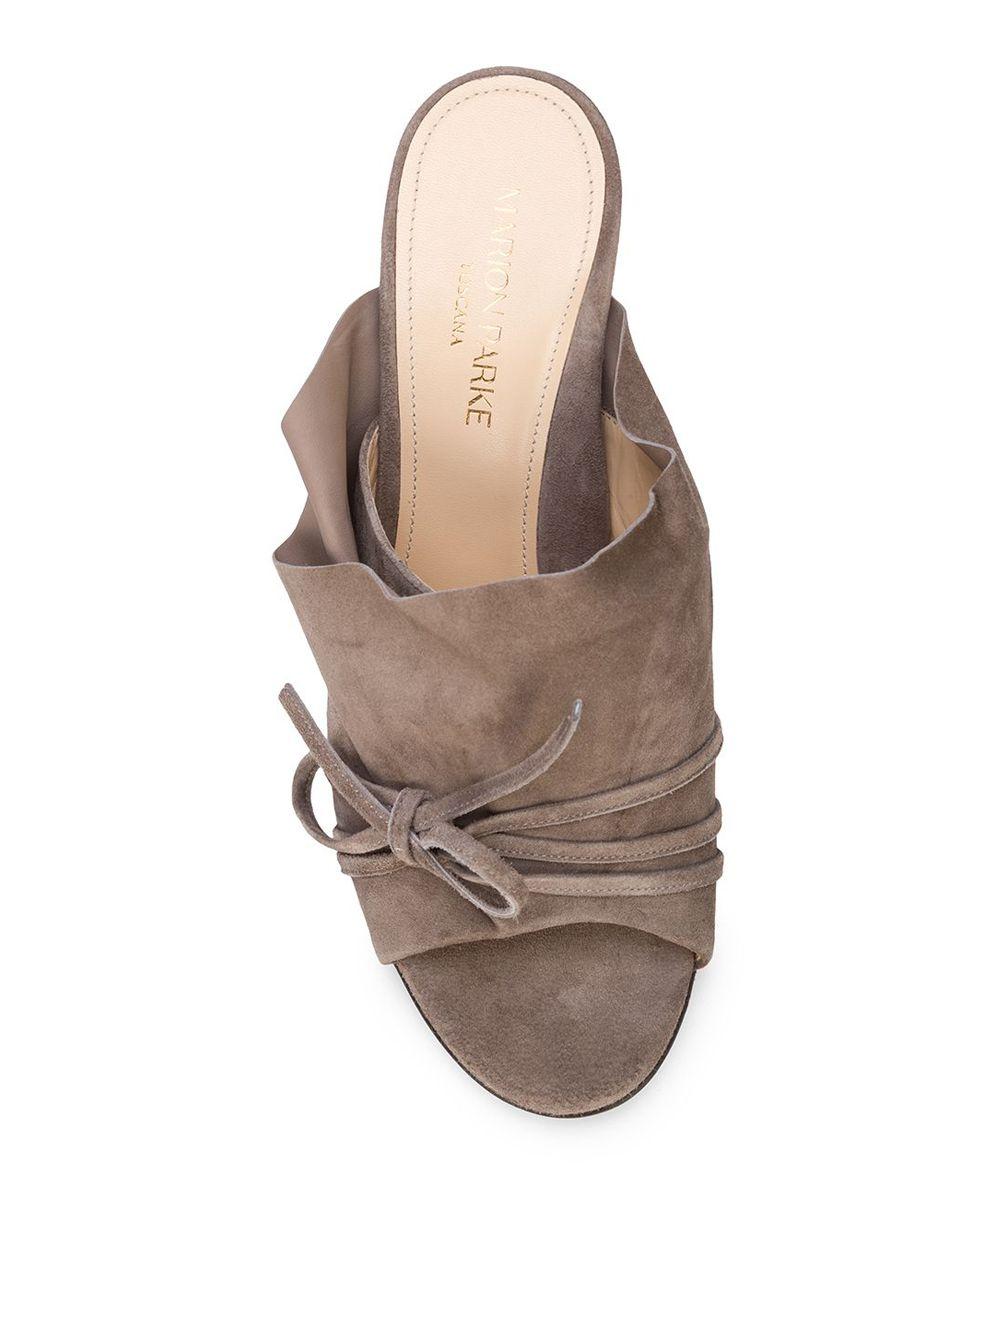 Marion Parke | Marion Parke мюли 'Lee' с открытым носком | Clouty